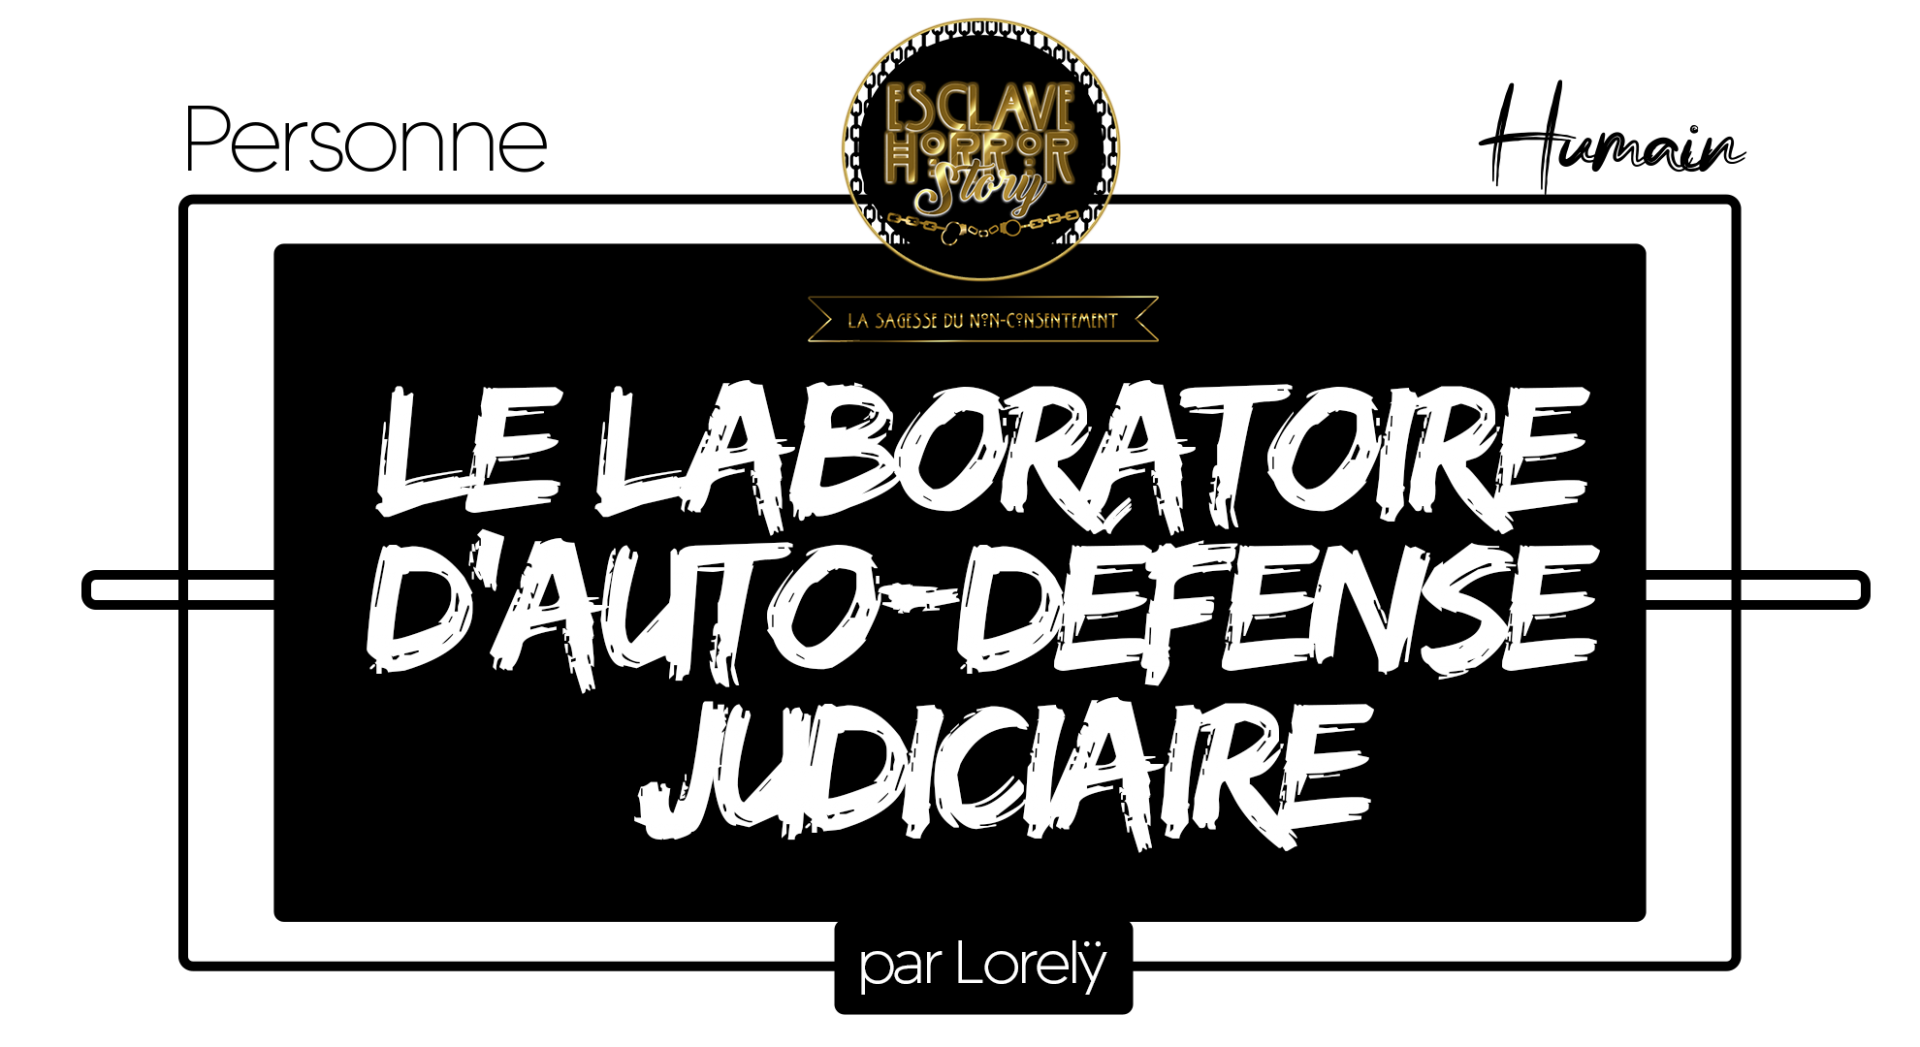 Laboratoire d auto defense judiciaire 1